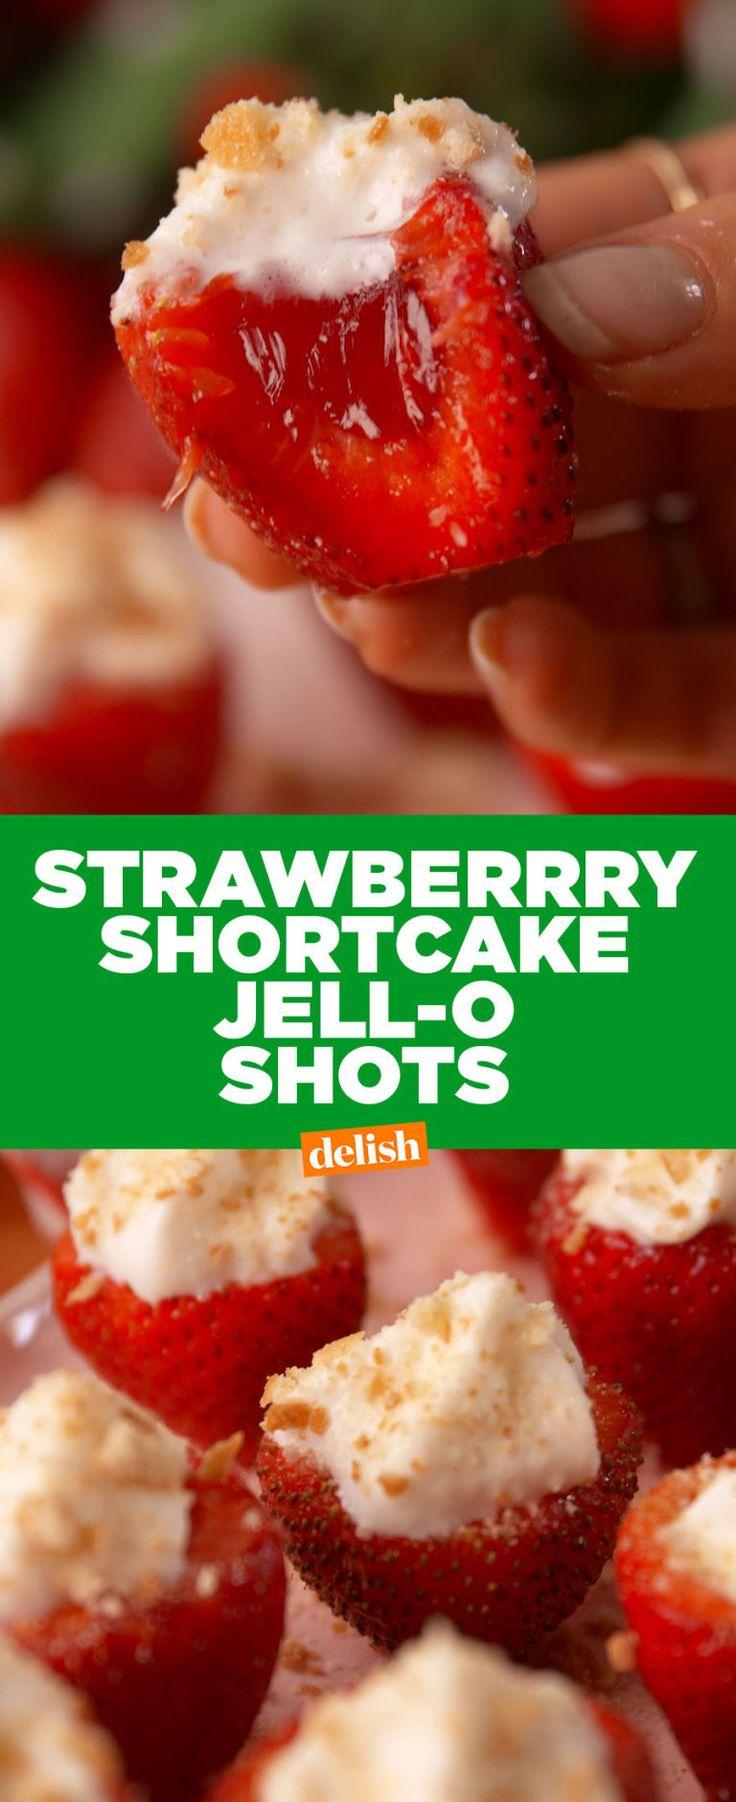 Strawberry Shortcake Jell-O Shots Are Our Go-To Boozy Summer Snack - Delish.com